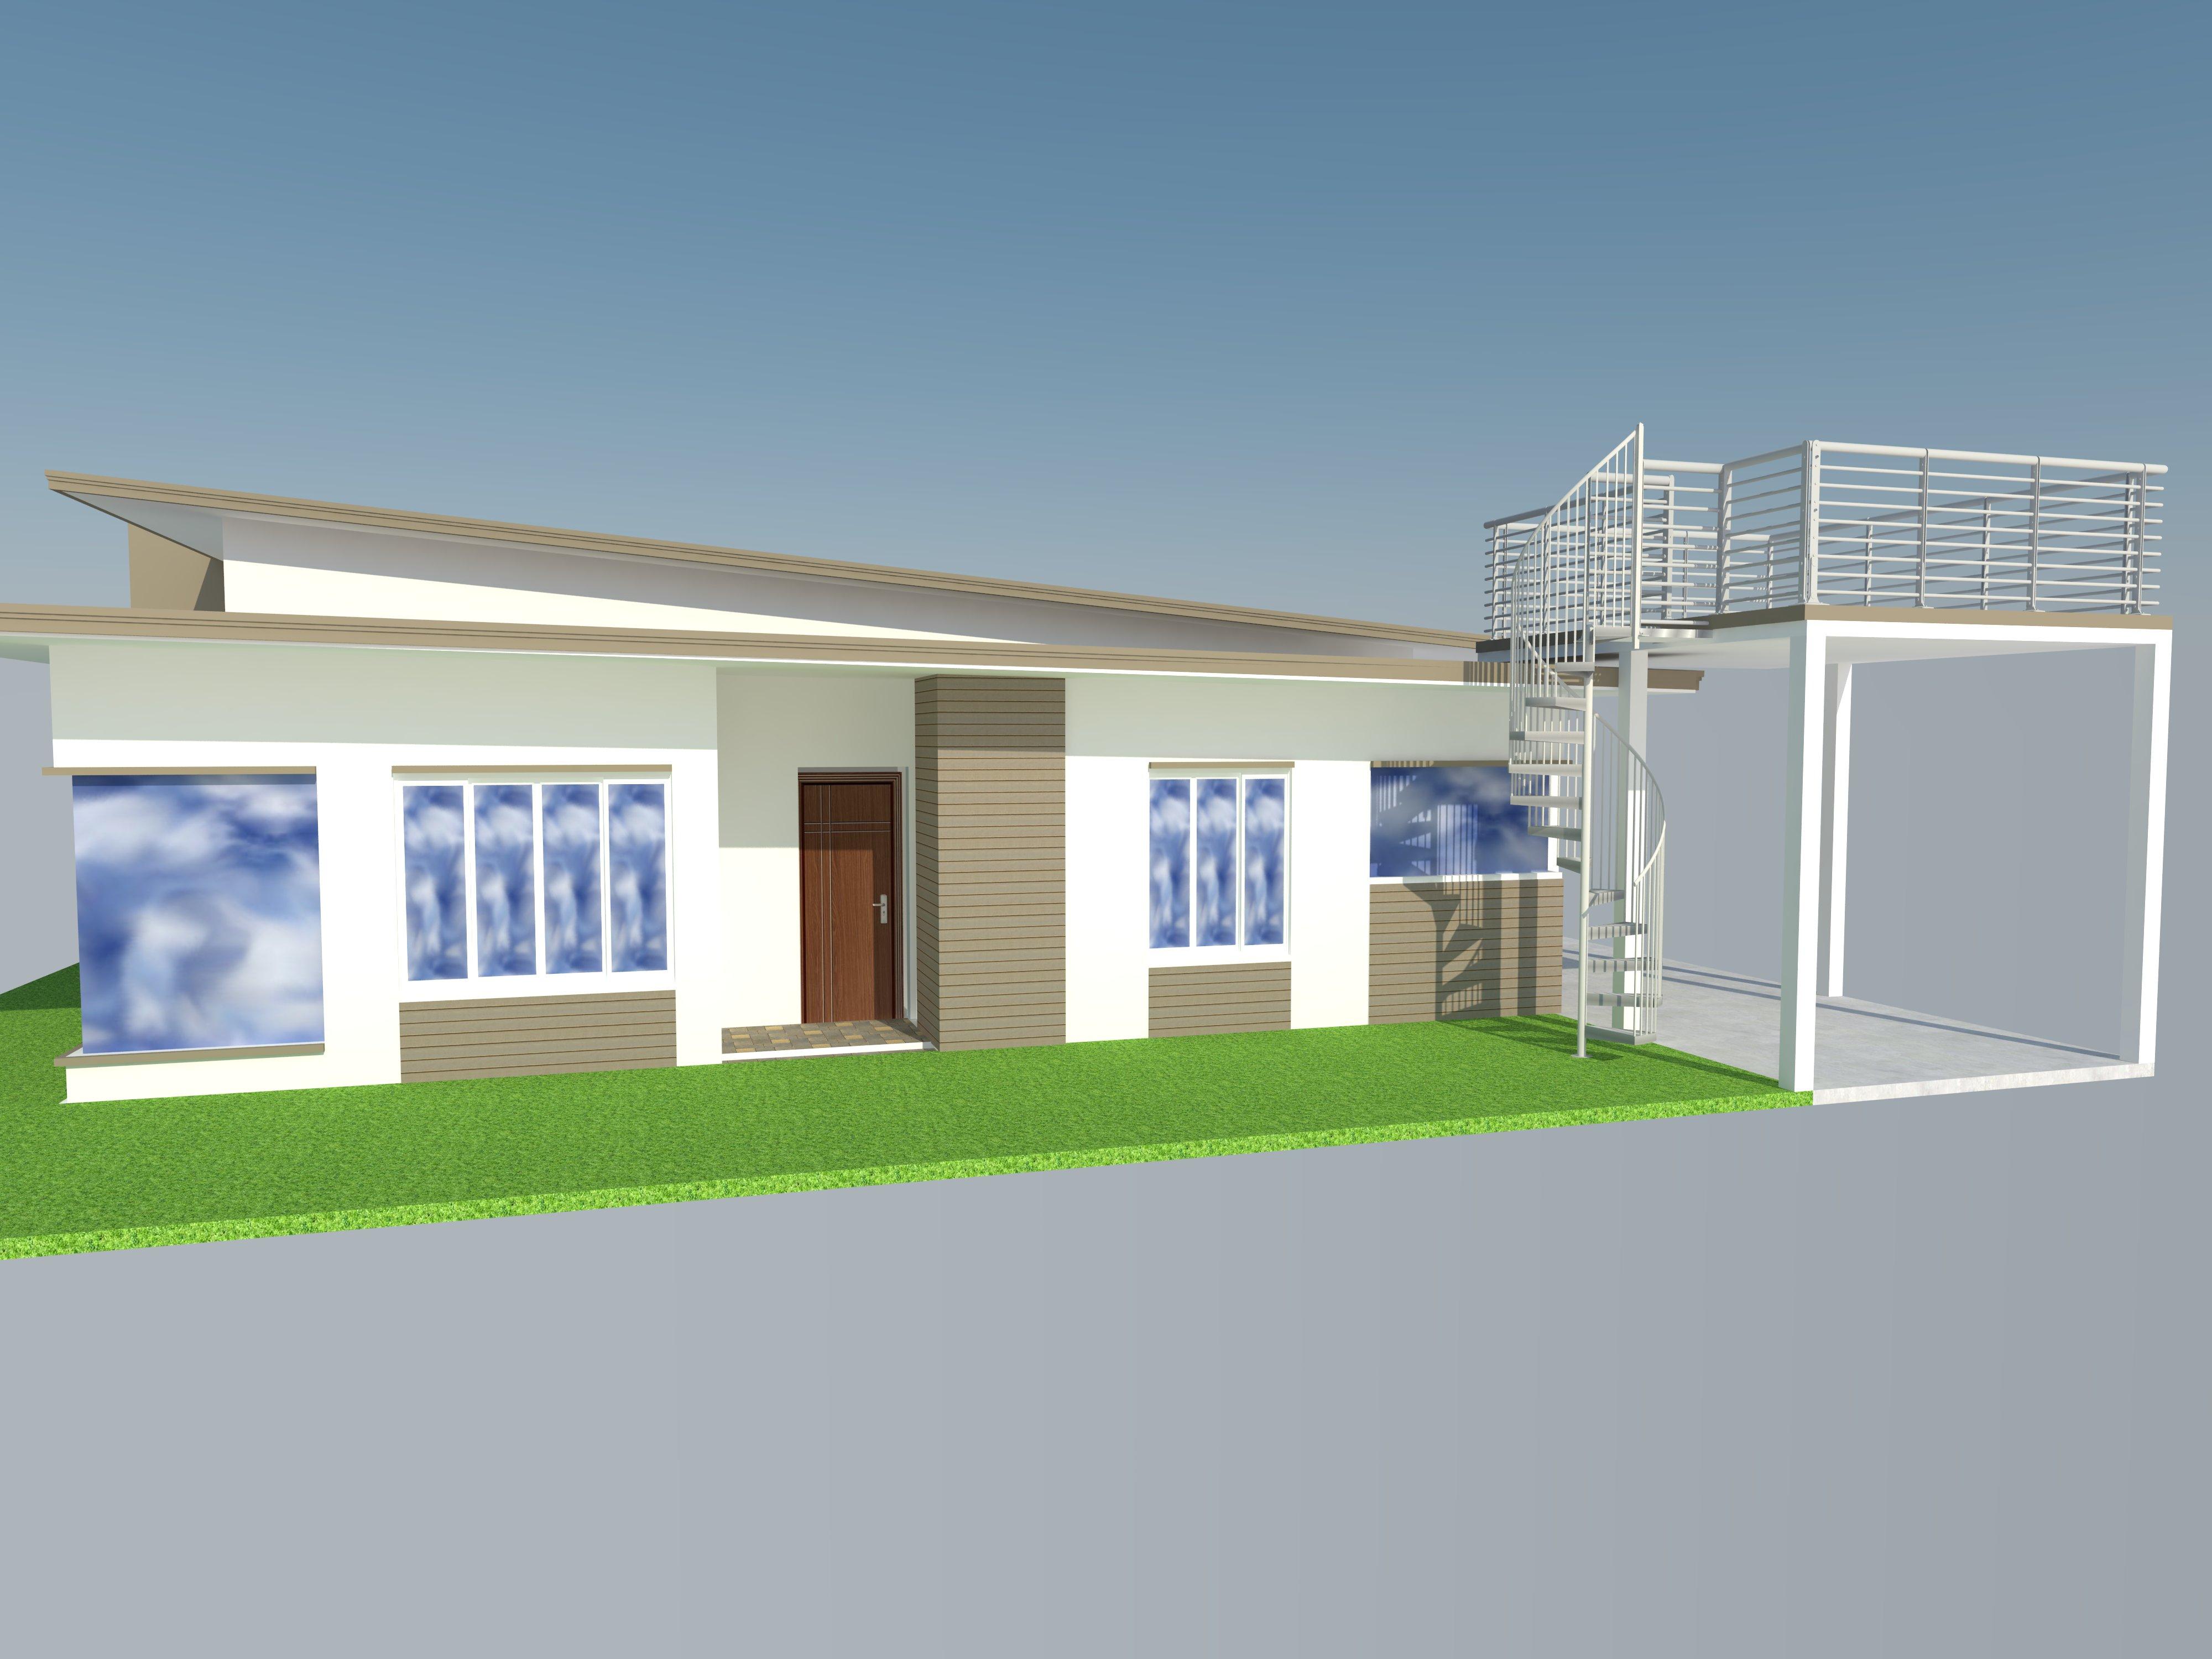 Bungalow Modern Zen House Design SketchUp Model CAD